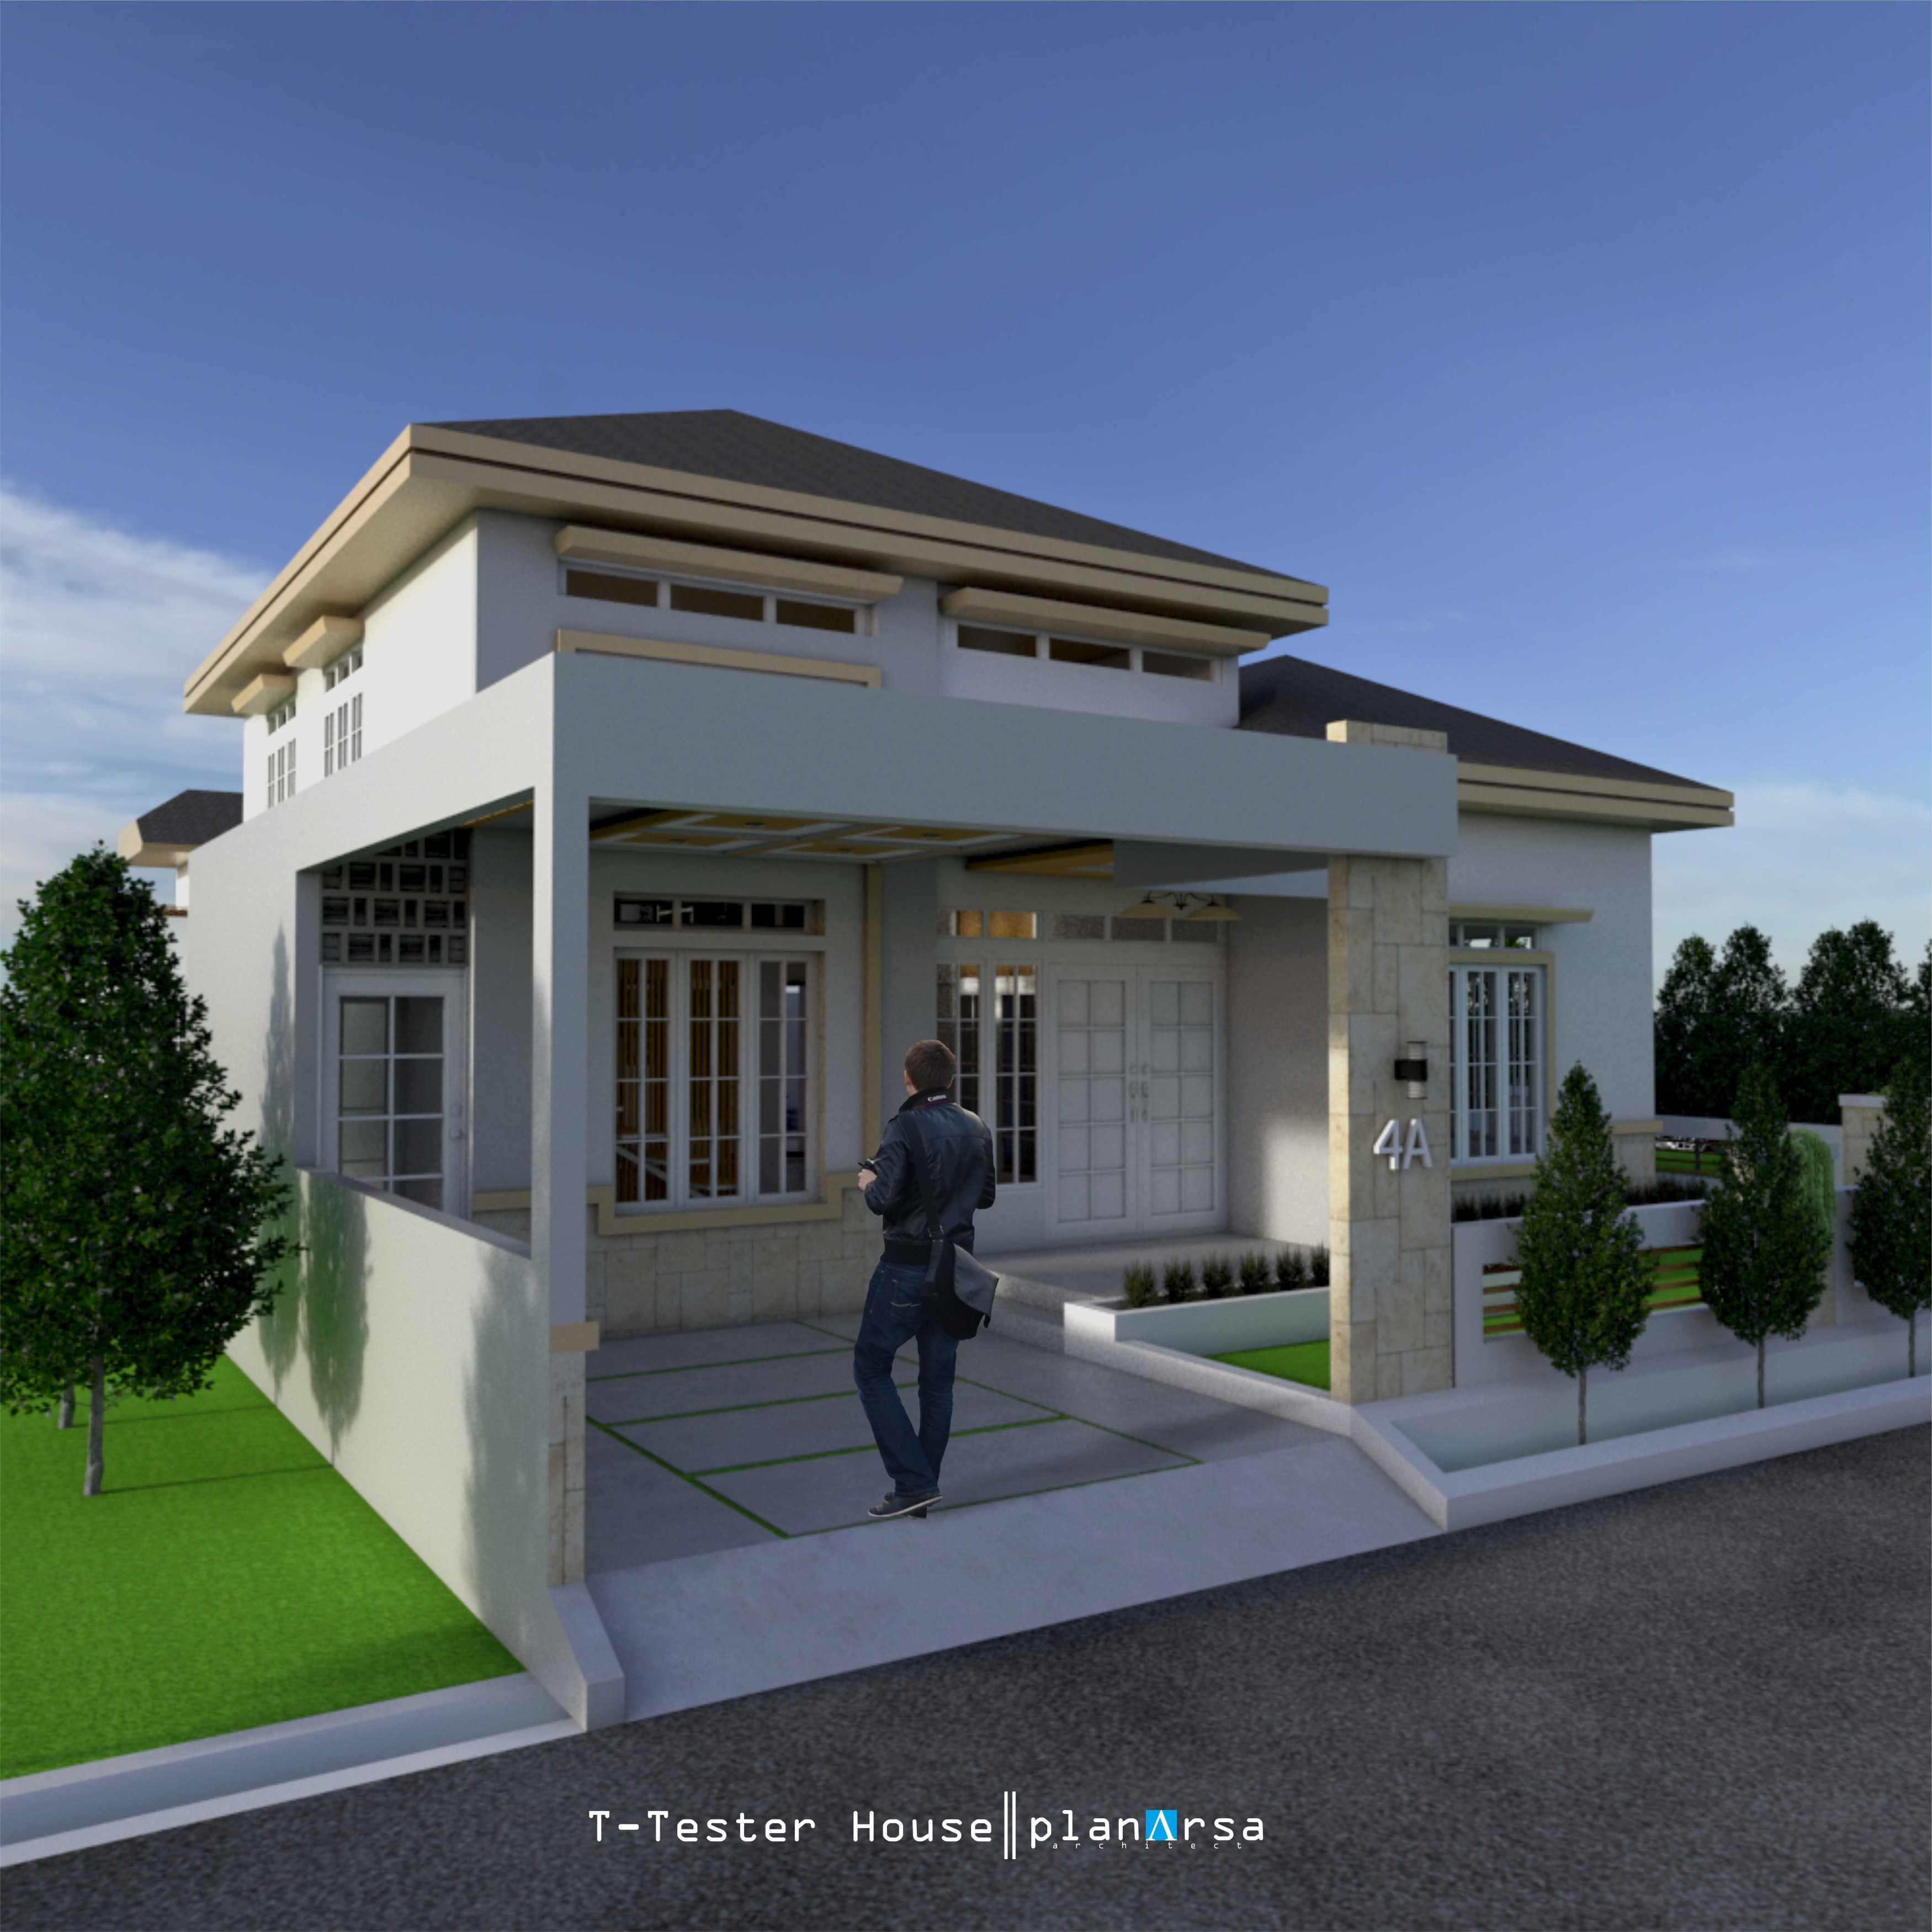 Planarsa Architect T-Tester House Aceh, Indonesia Aceh, Indonesia Planarsa-Architect-T-Tester-House   79251